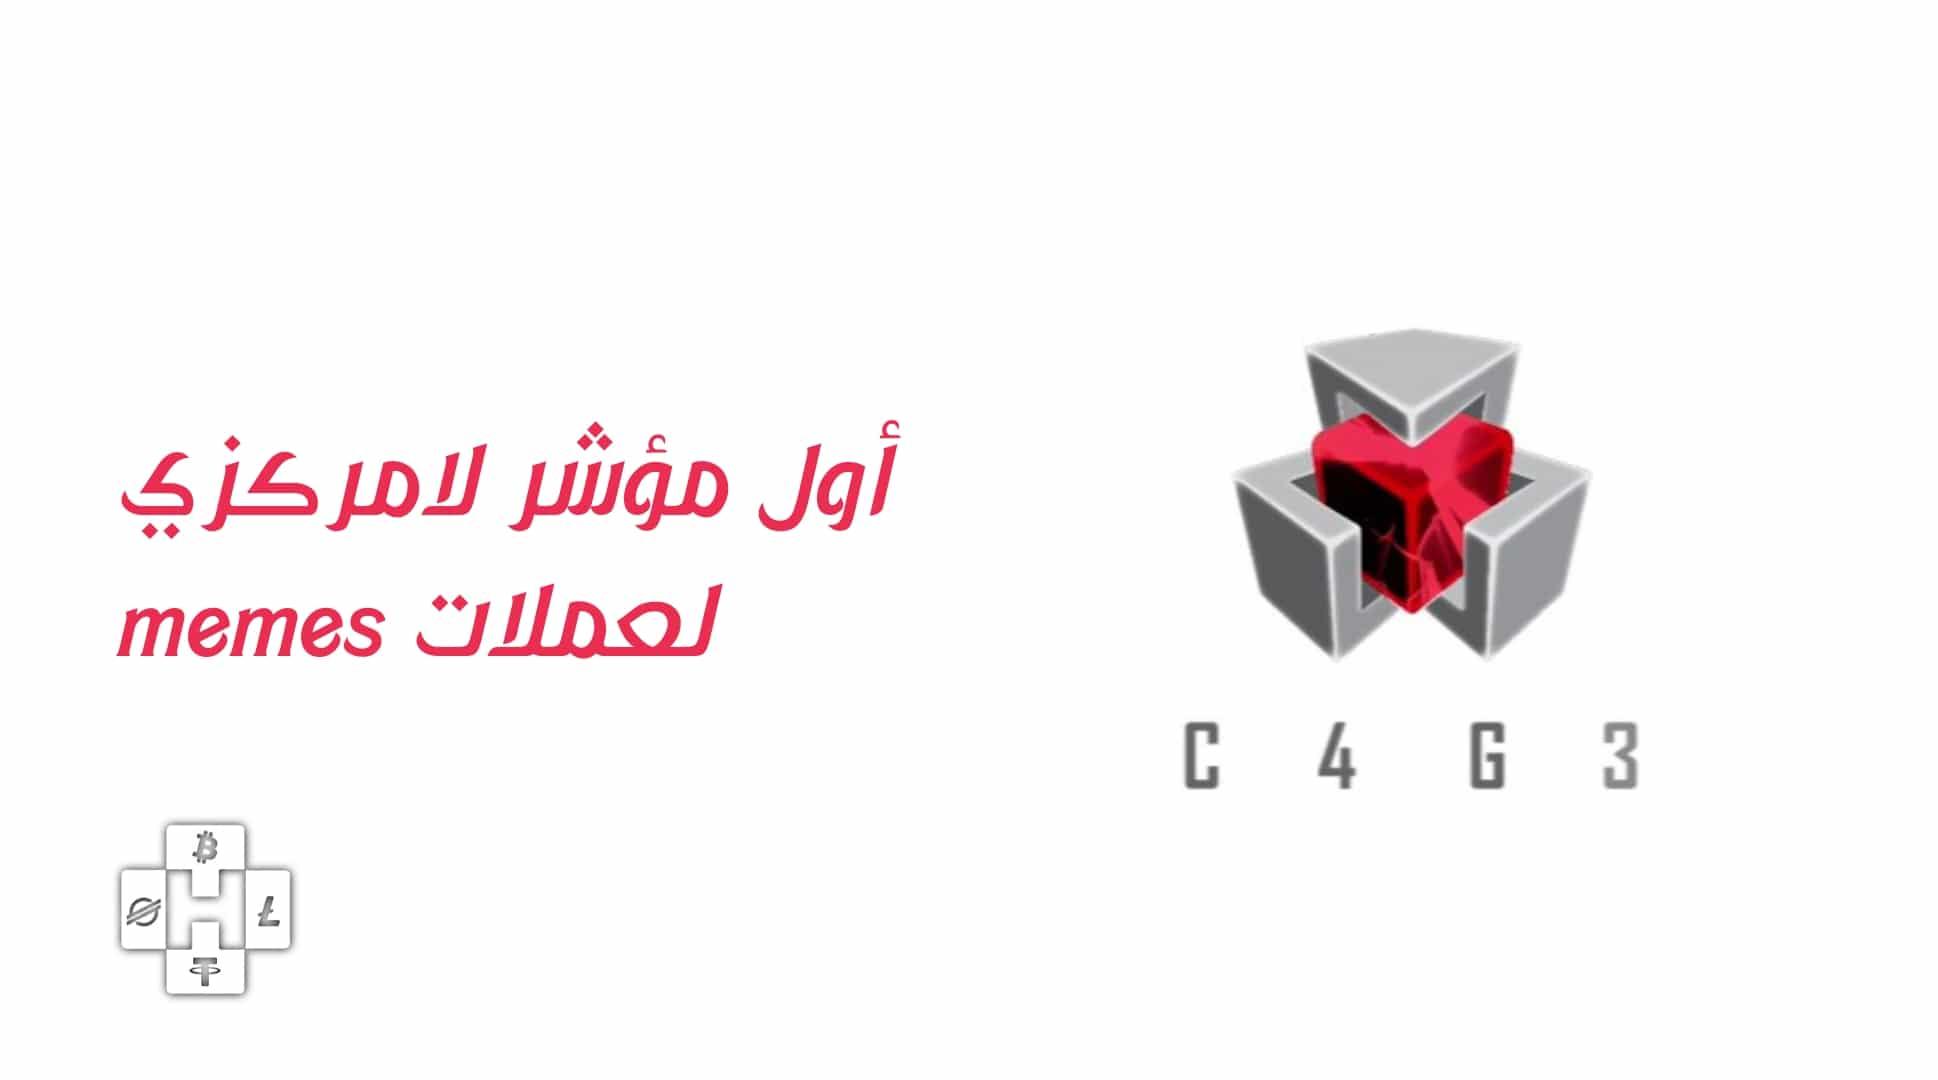 C4G3 (CAGE)